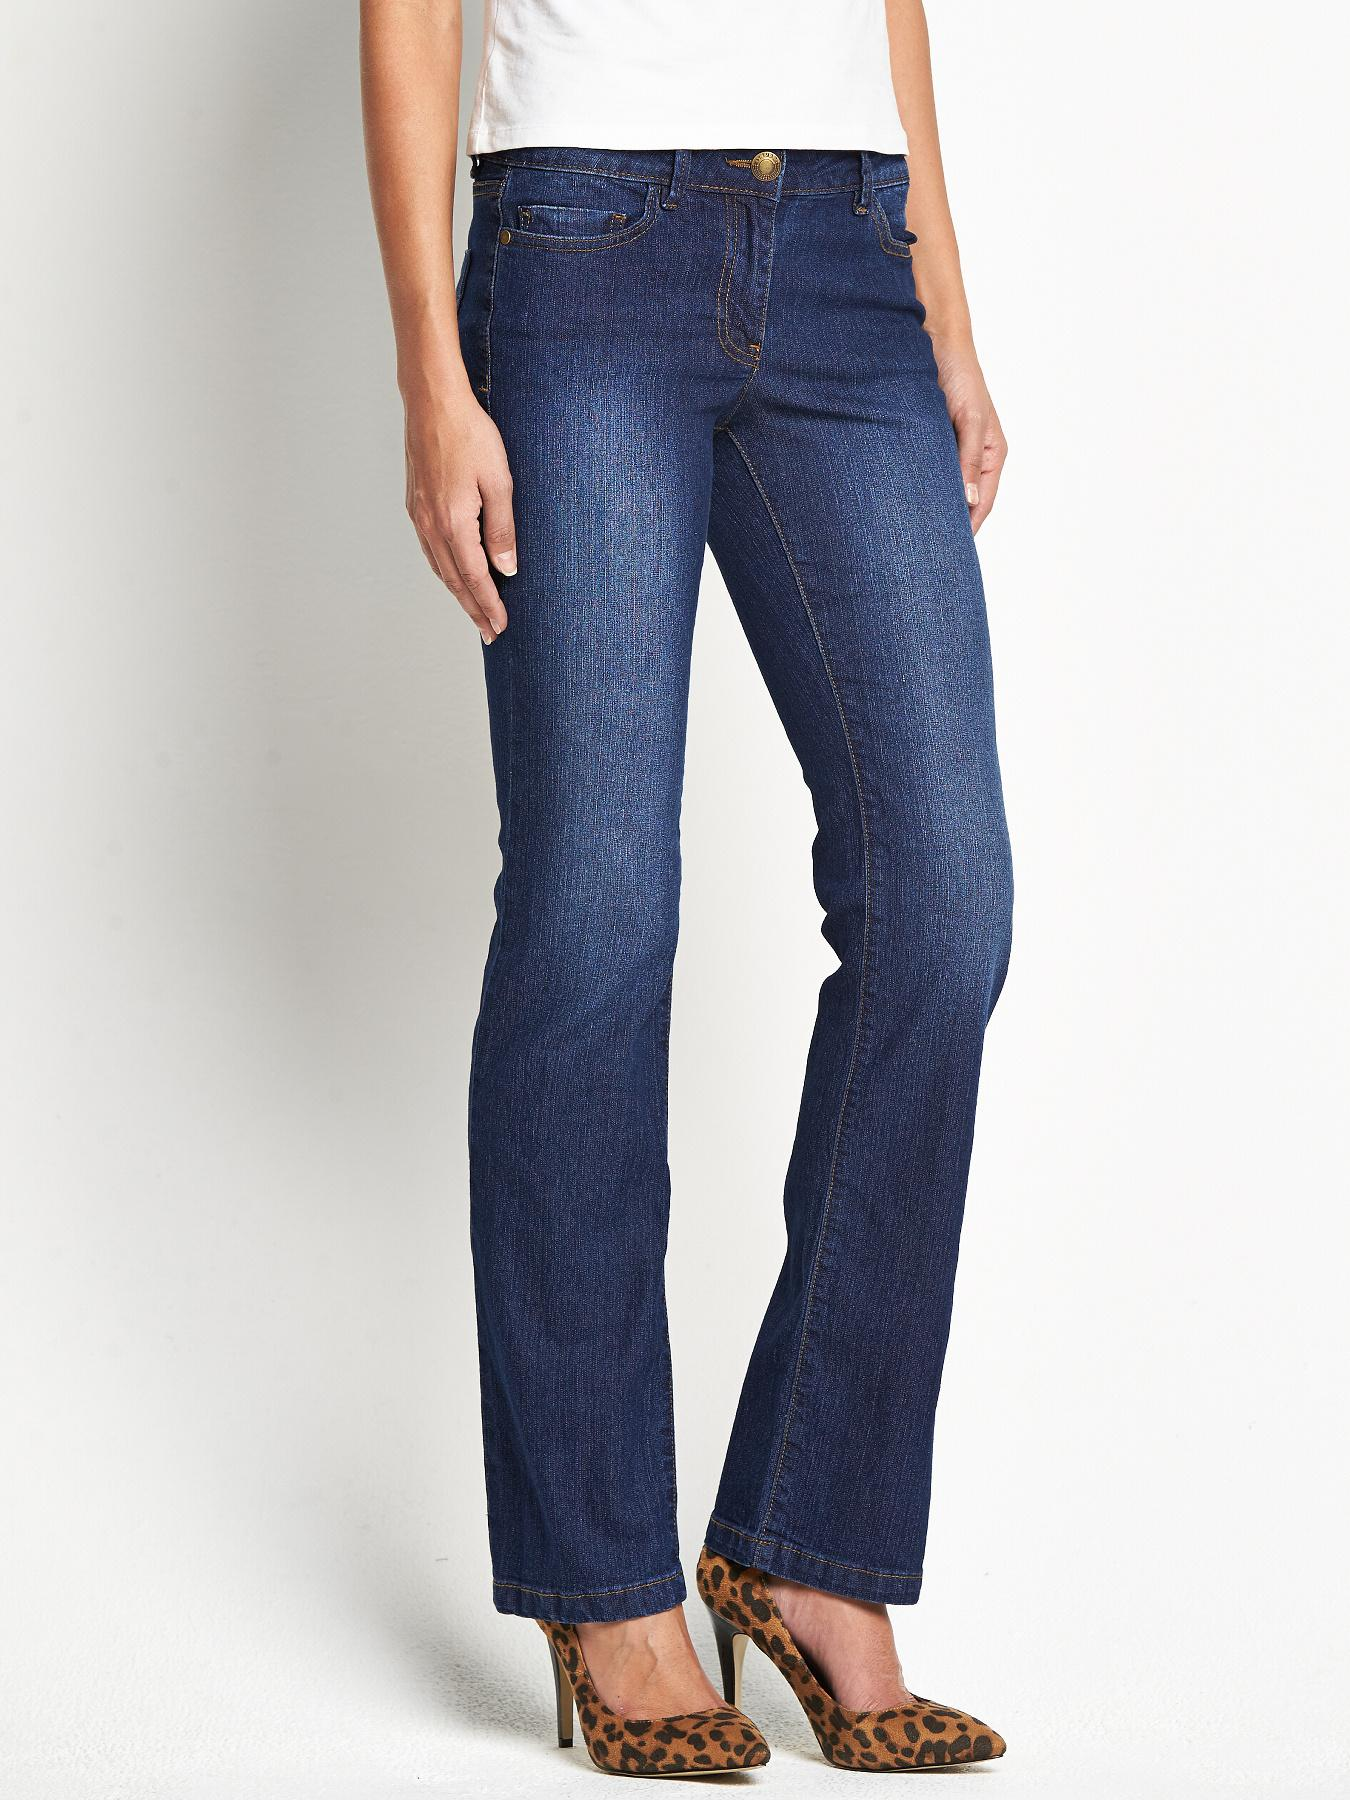 South Petite Opp Bootcut Jeans - Black, Black,Indigo